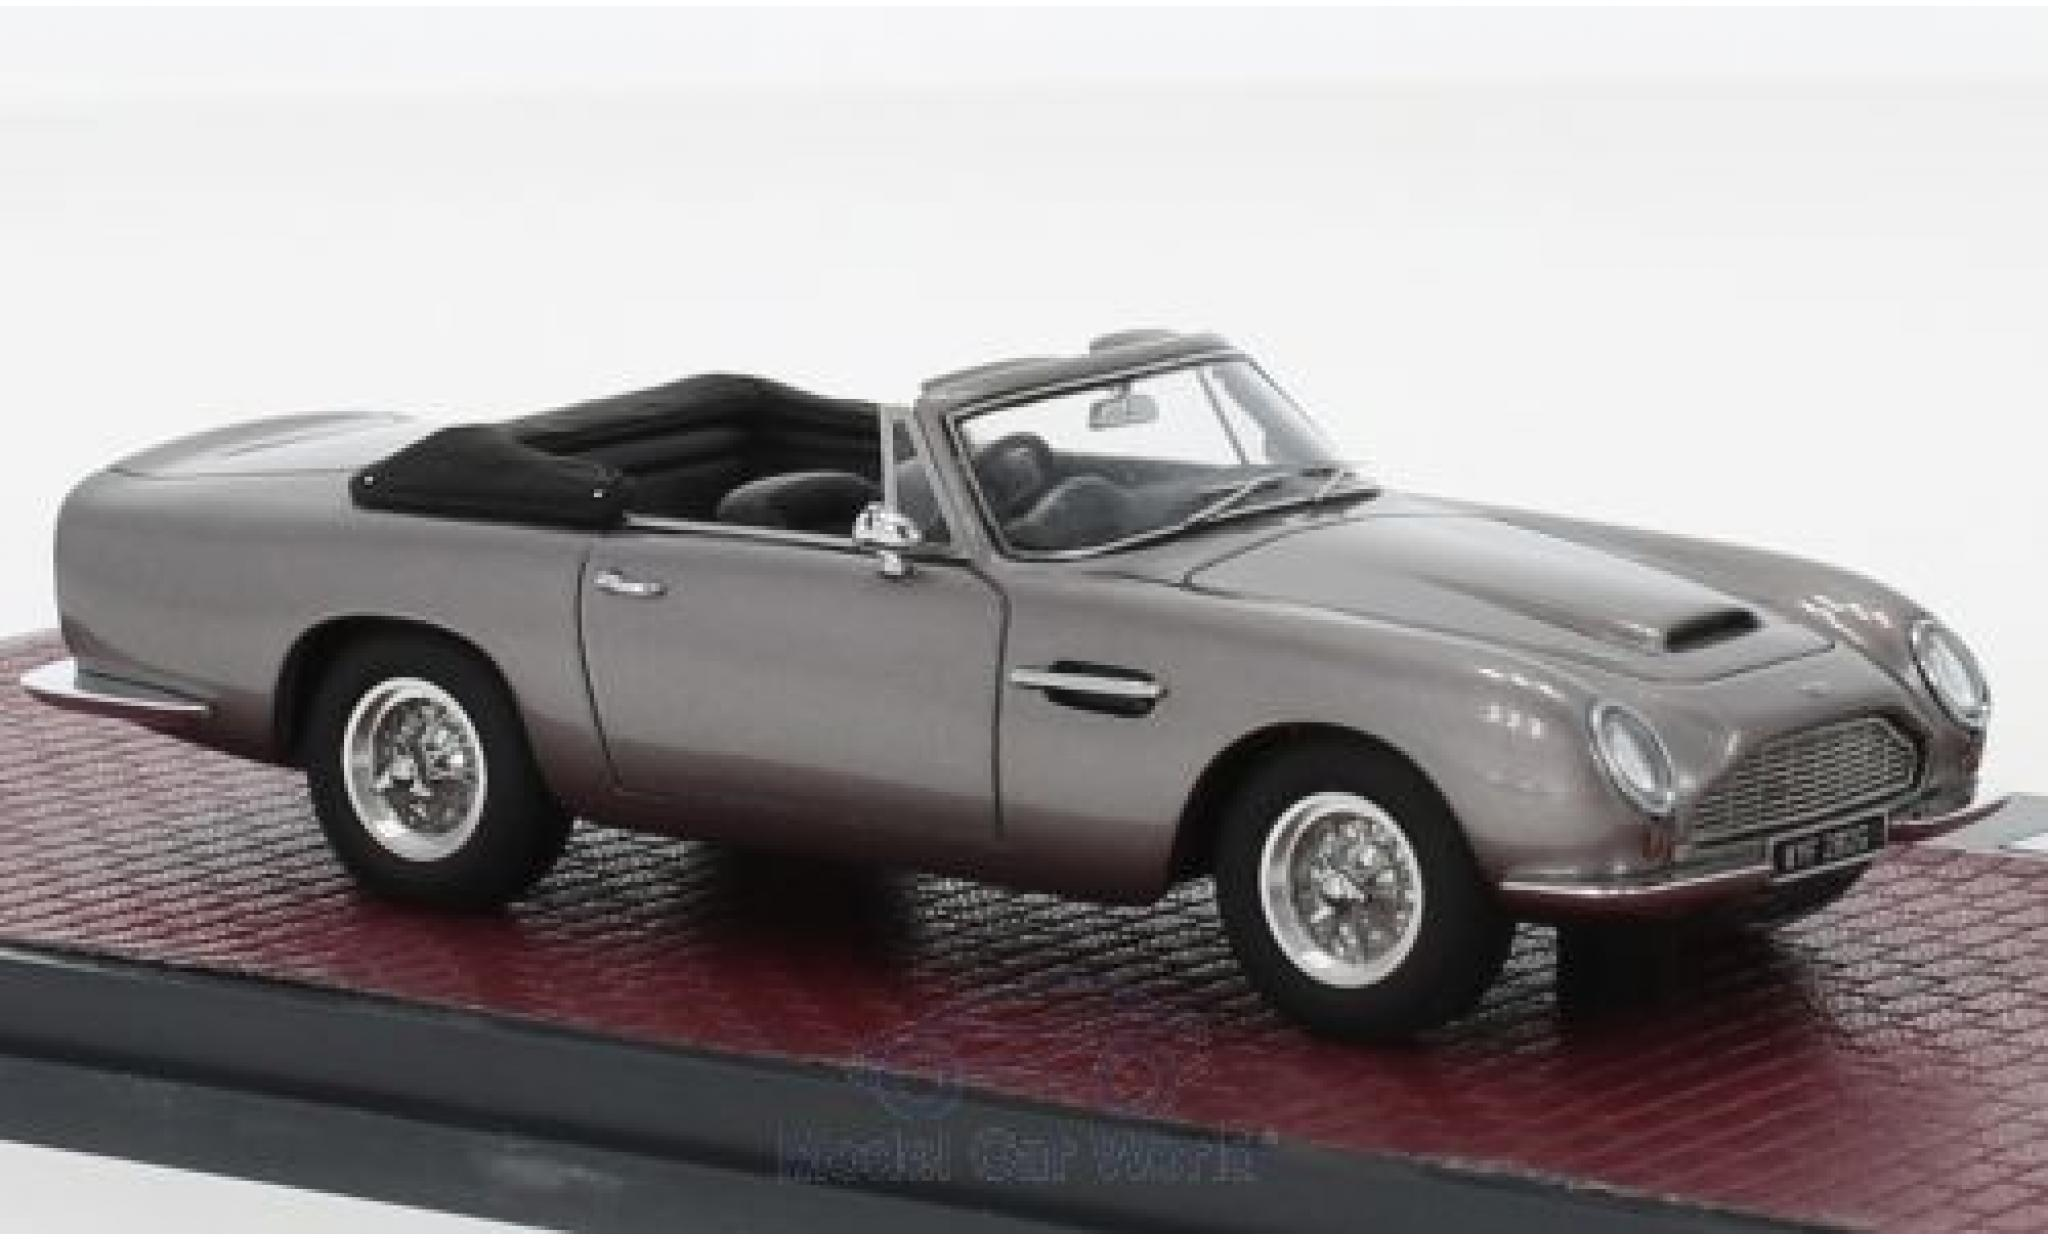 Aston Martin DB6 1/43 Matrix Volante metallise grise RHD 1968